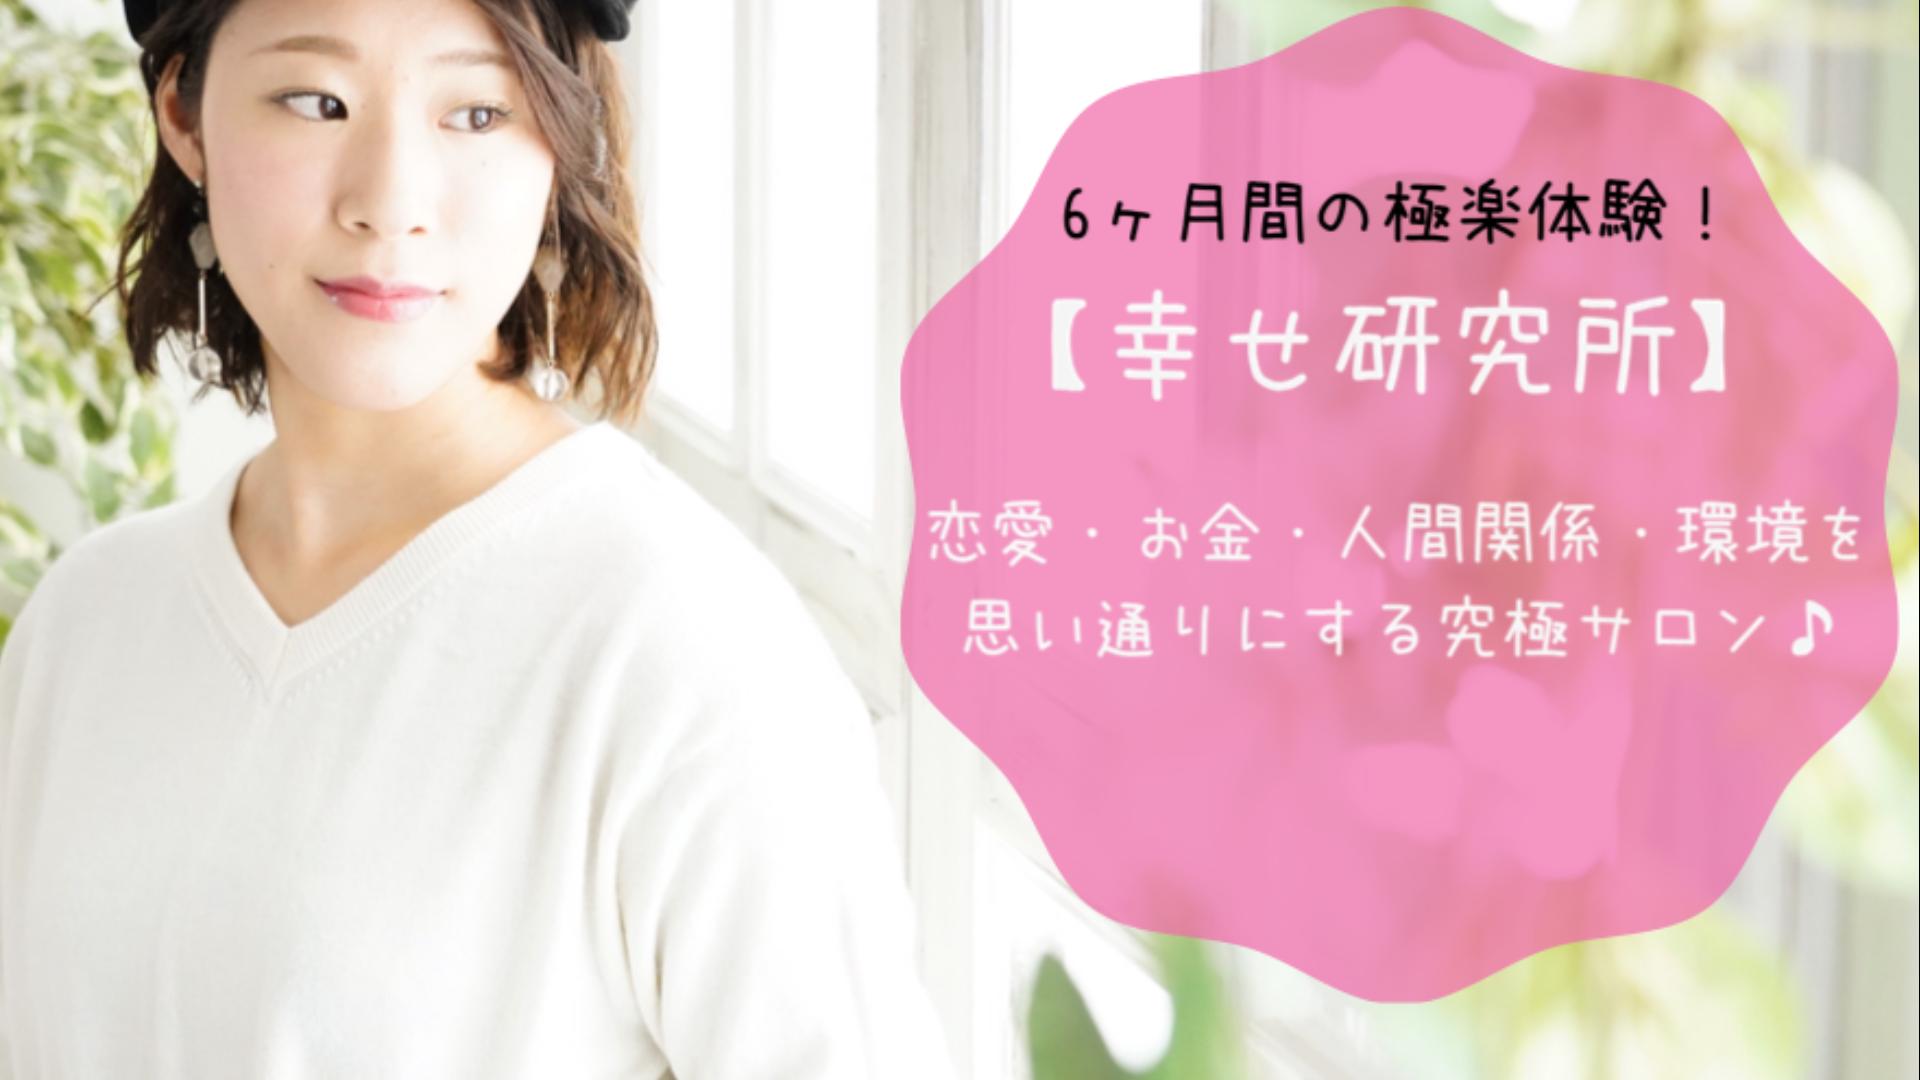 Ai Miura - AI 〜思い通りの人生を叶える6ヶ月の究極サロン〜【幸せ研究所】 - DMM オンラインサロン